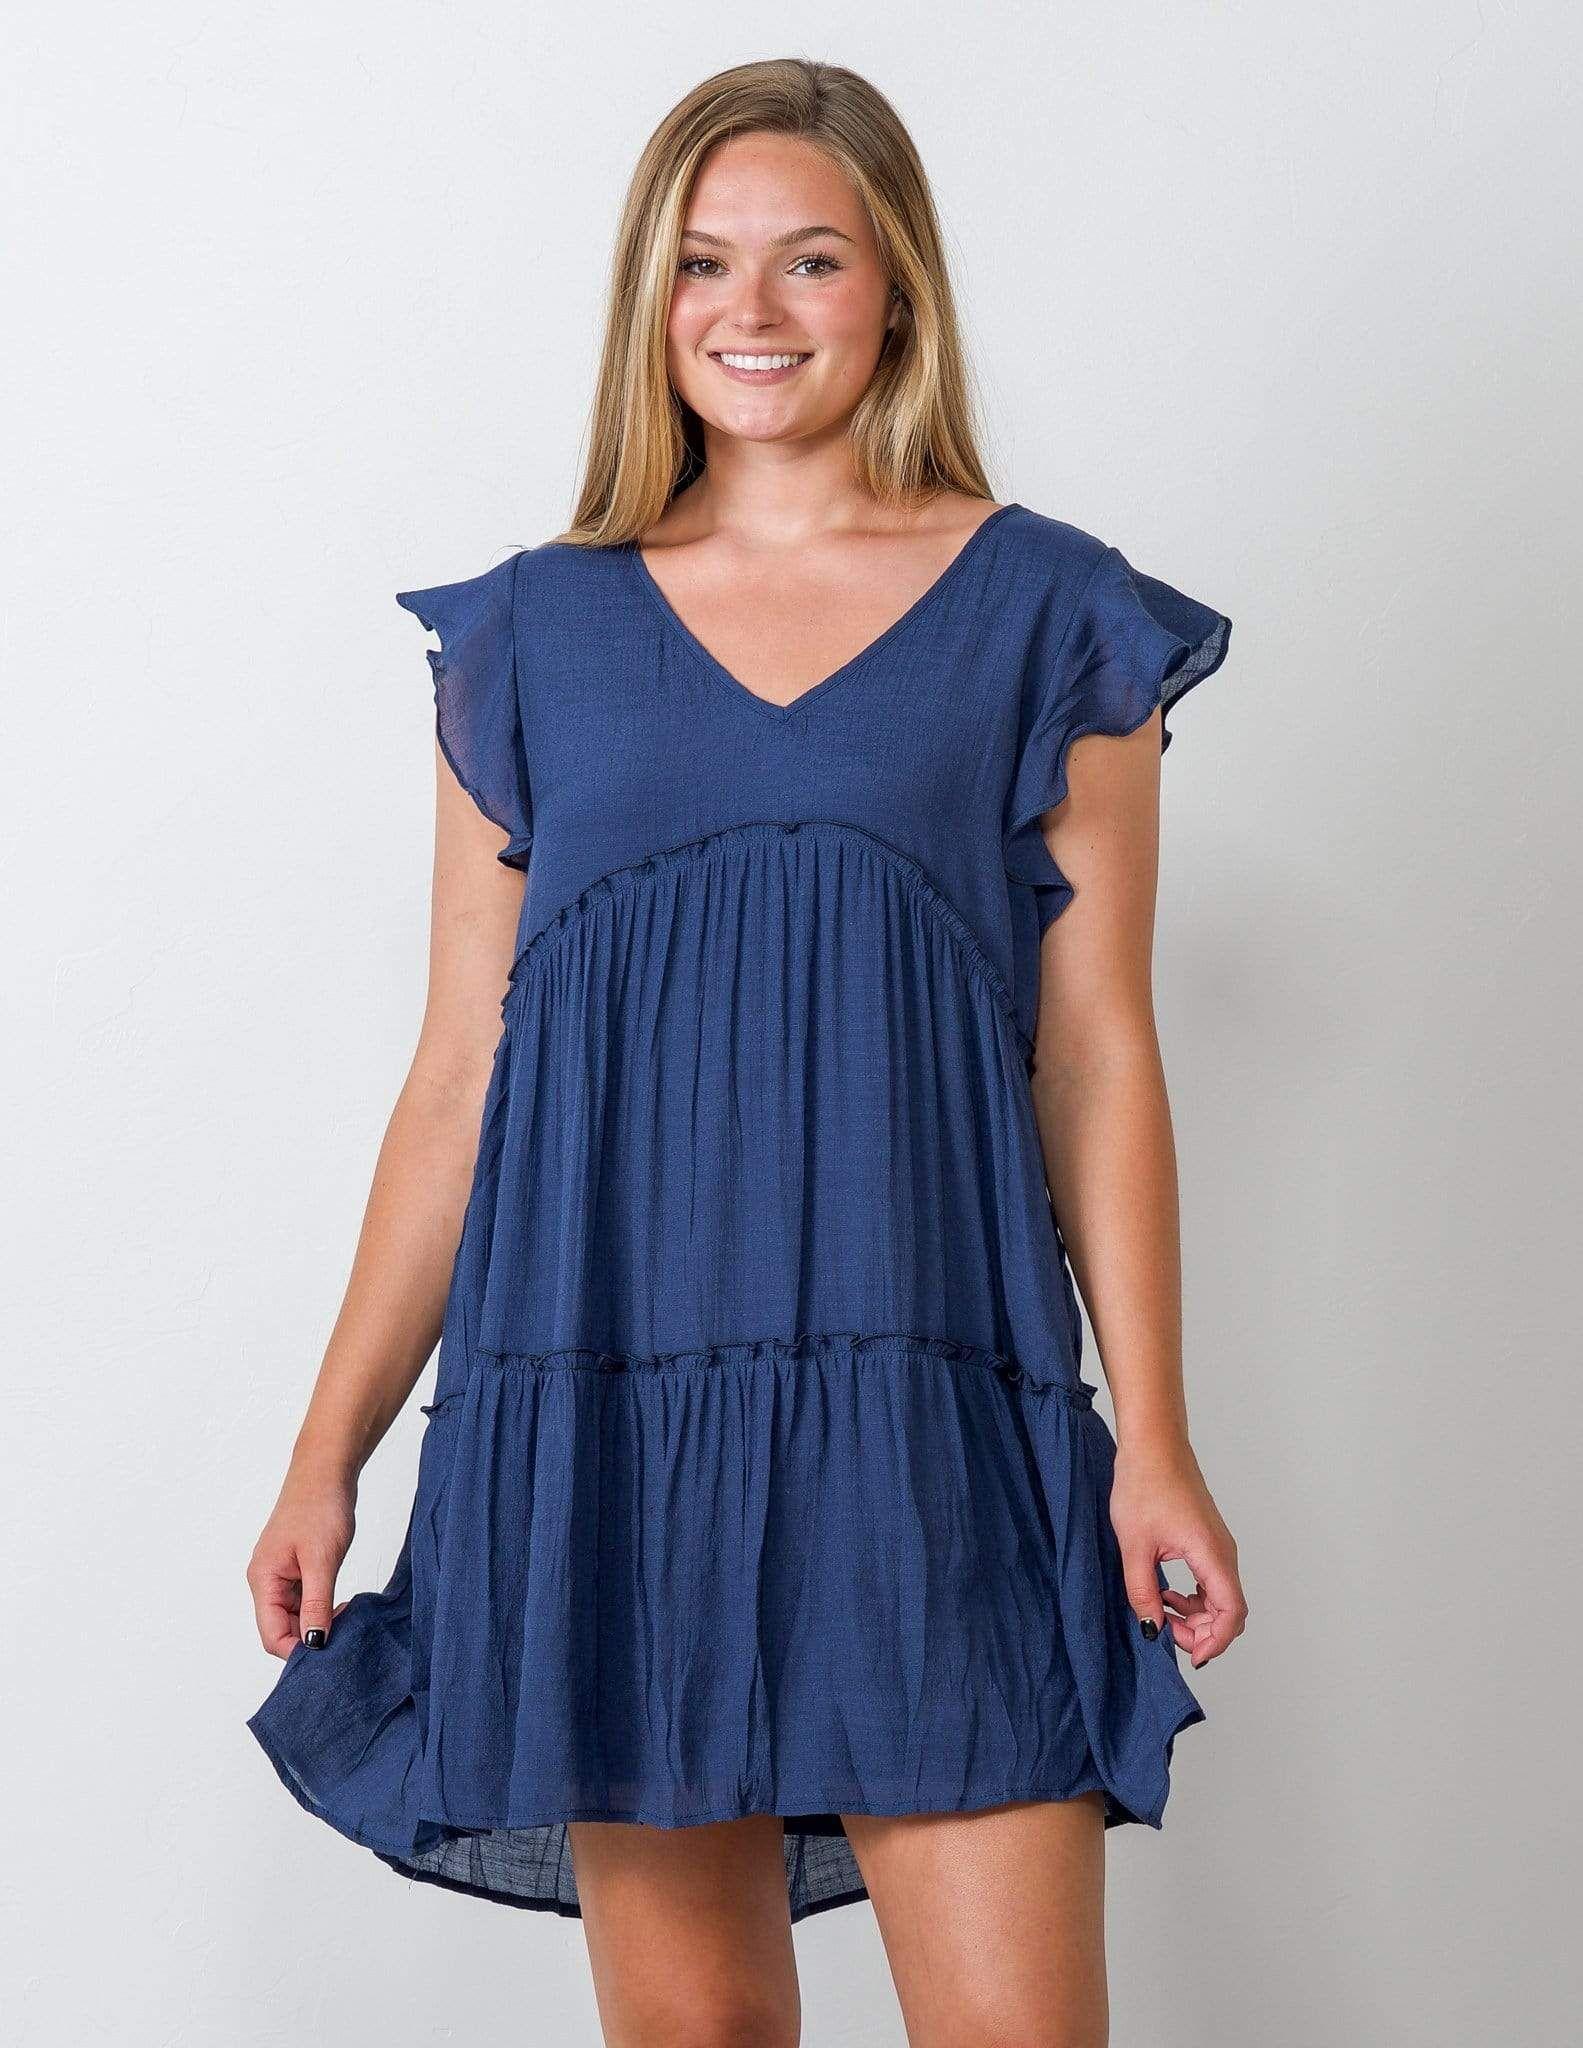 Paradise Blue Babydoll Flutter Dress L In 2021 Flutter Dress Gameday Dress Dresses [ 2048 x 1583 Pixel ]